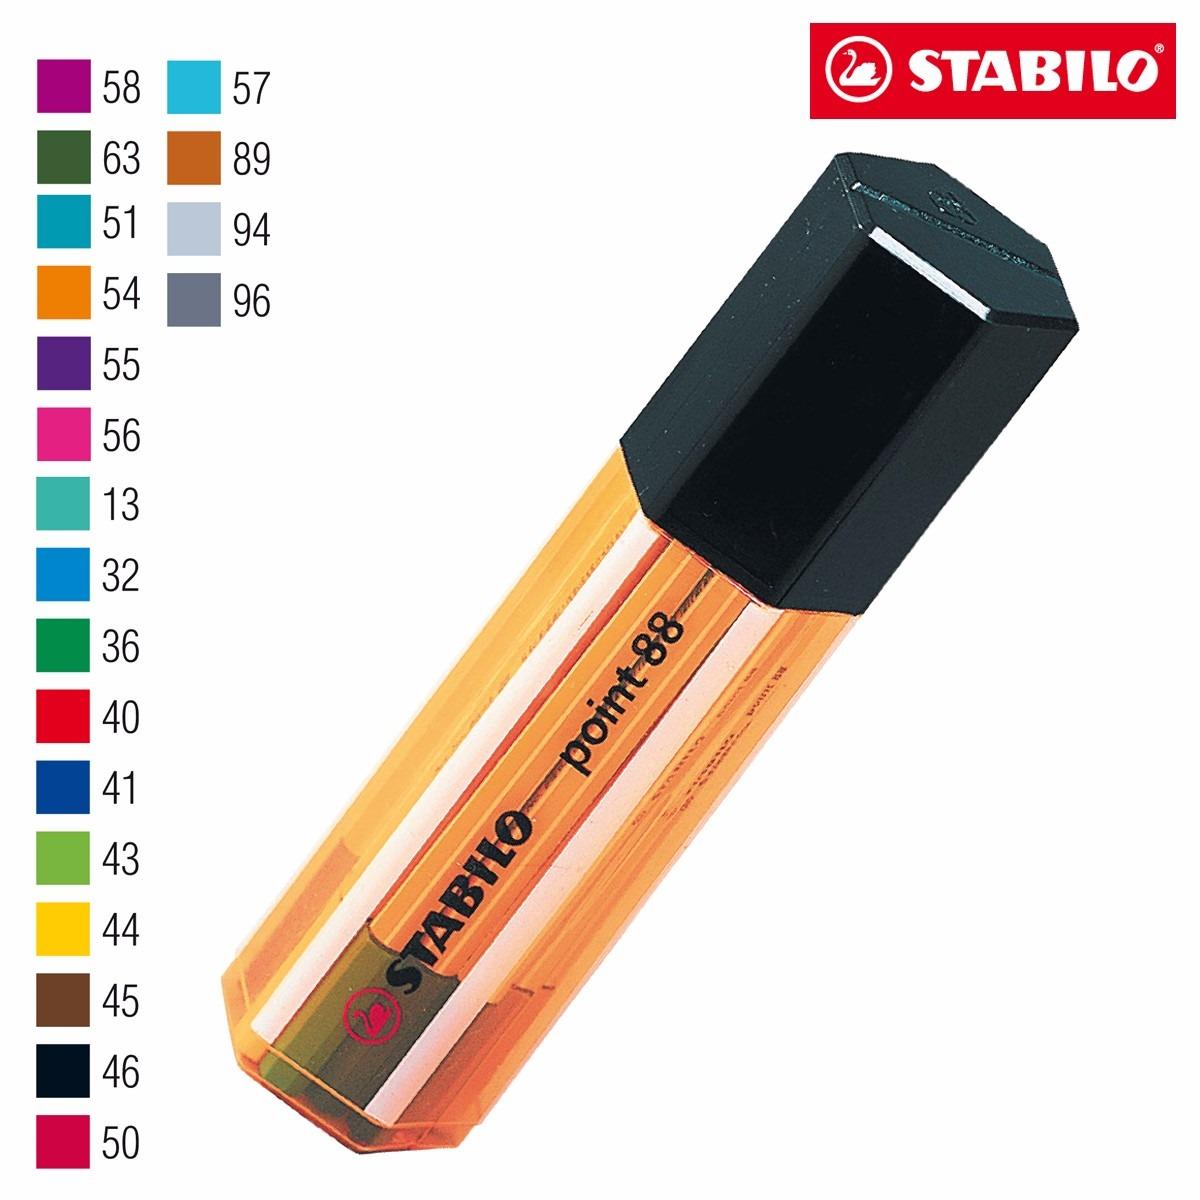 Caneta Point Cores Stabilo tubo com 20 cores 8820-1  unid.